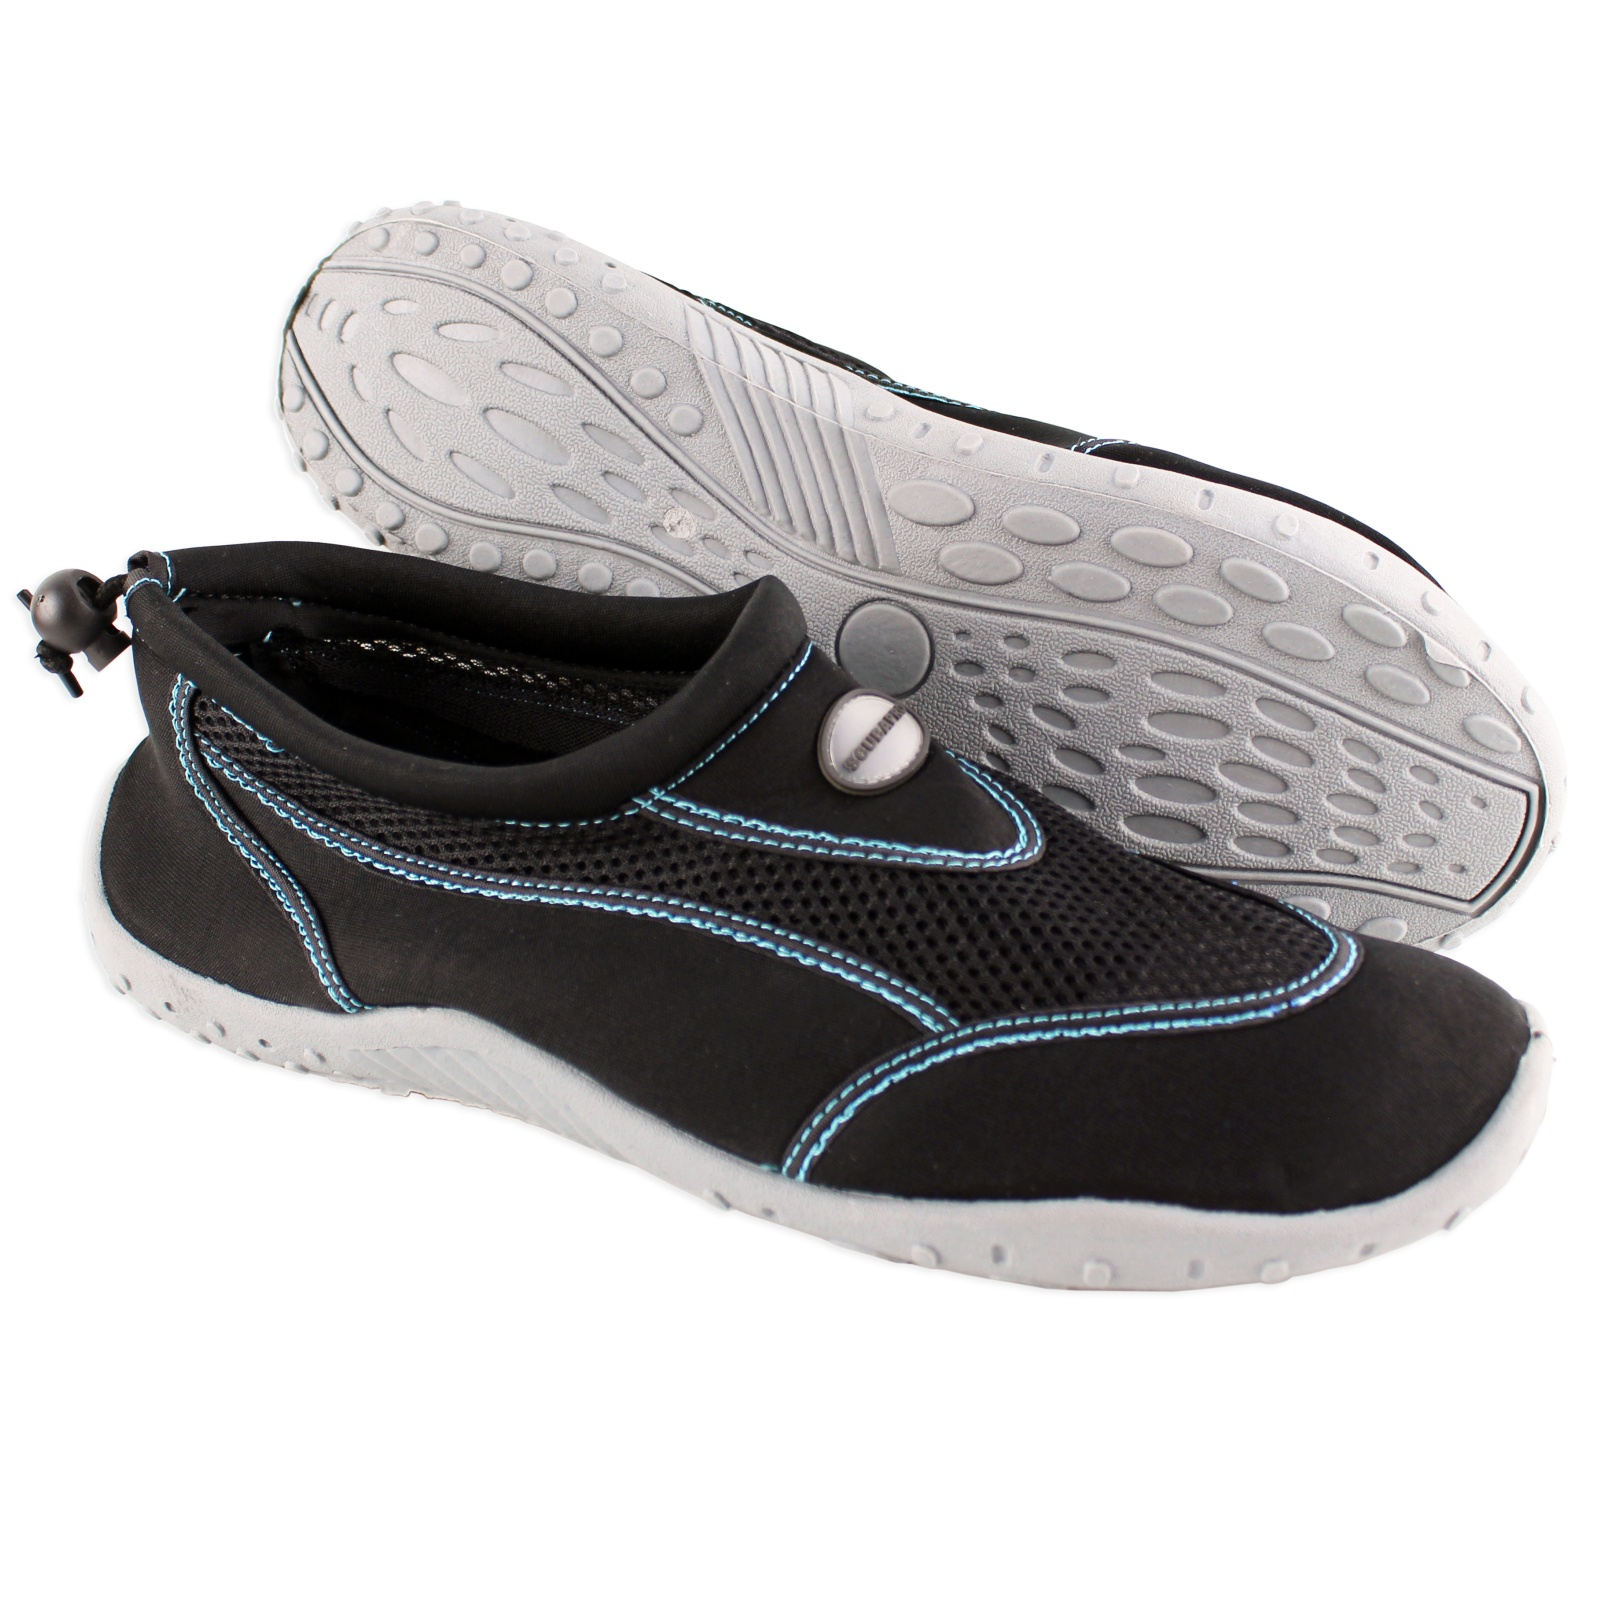 Neoprenové boty SCUBAPRO Kailua - vel. 33